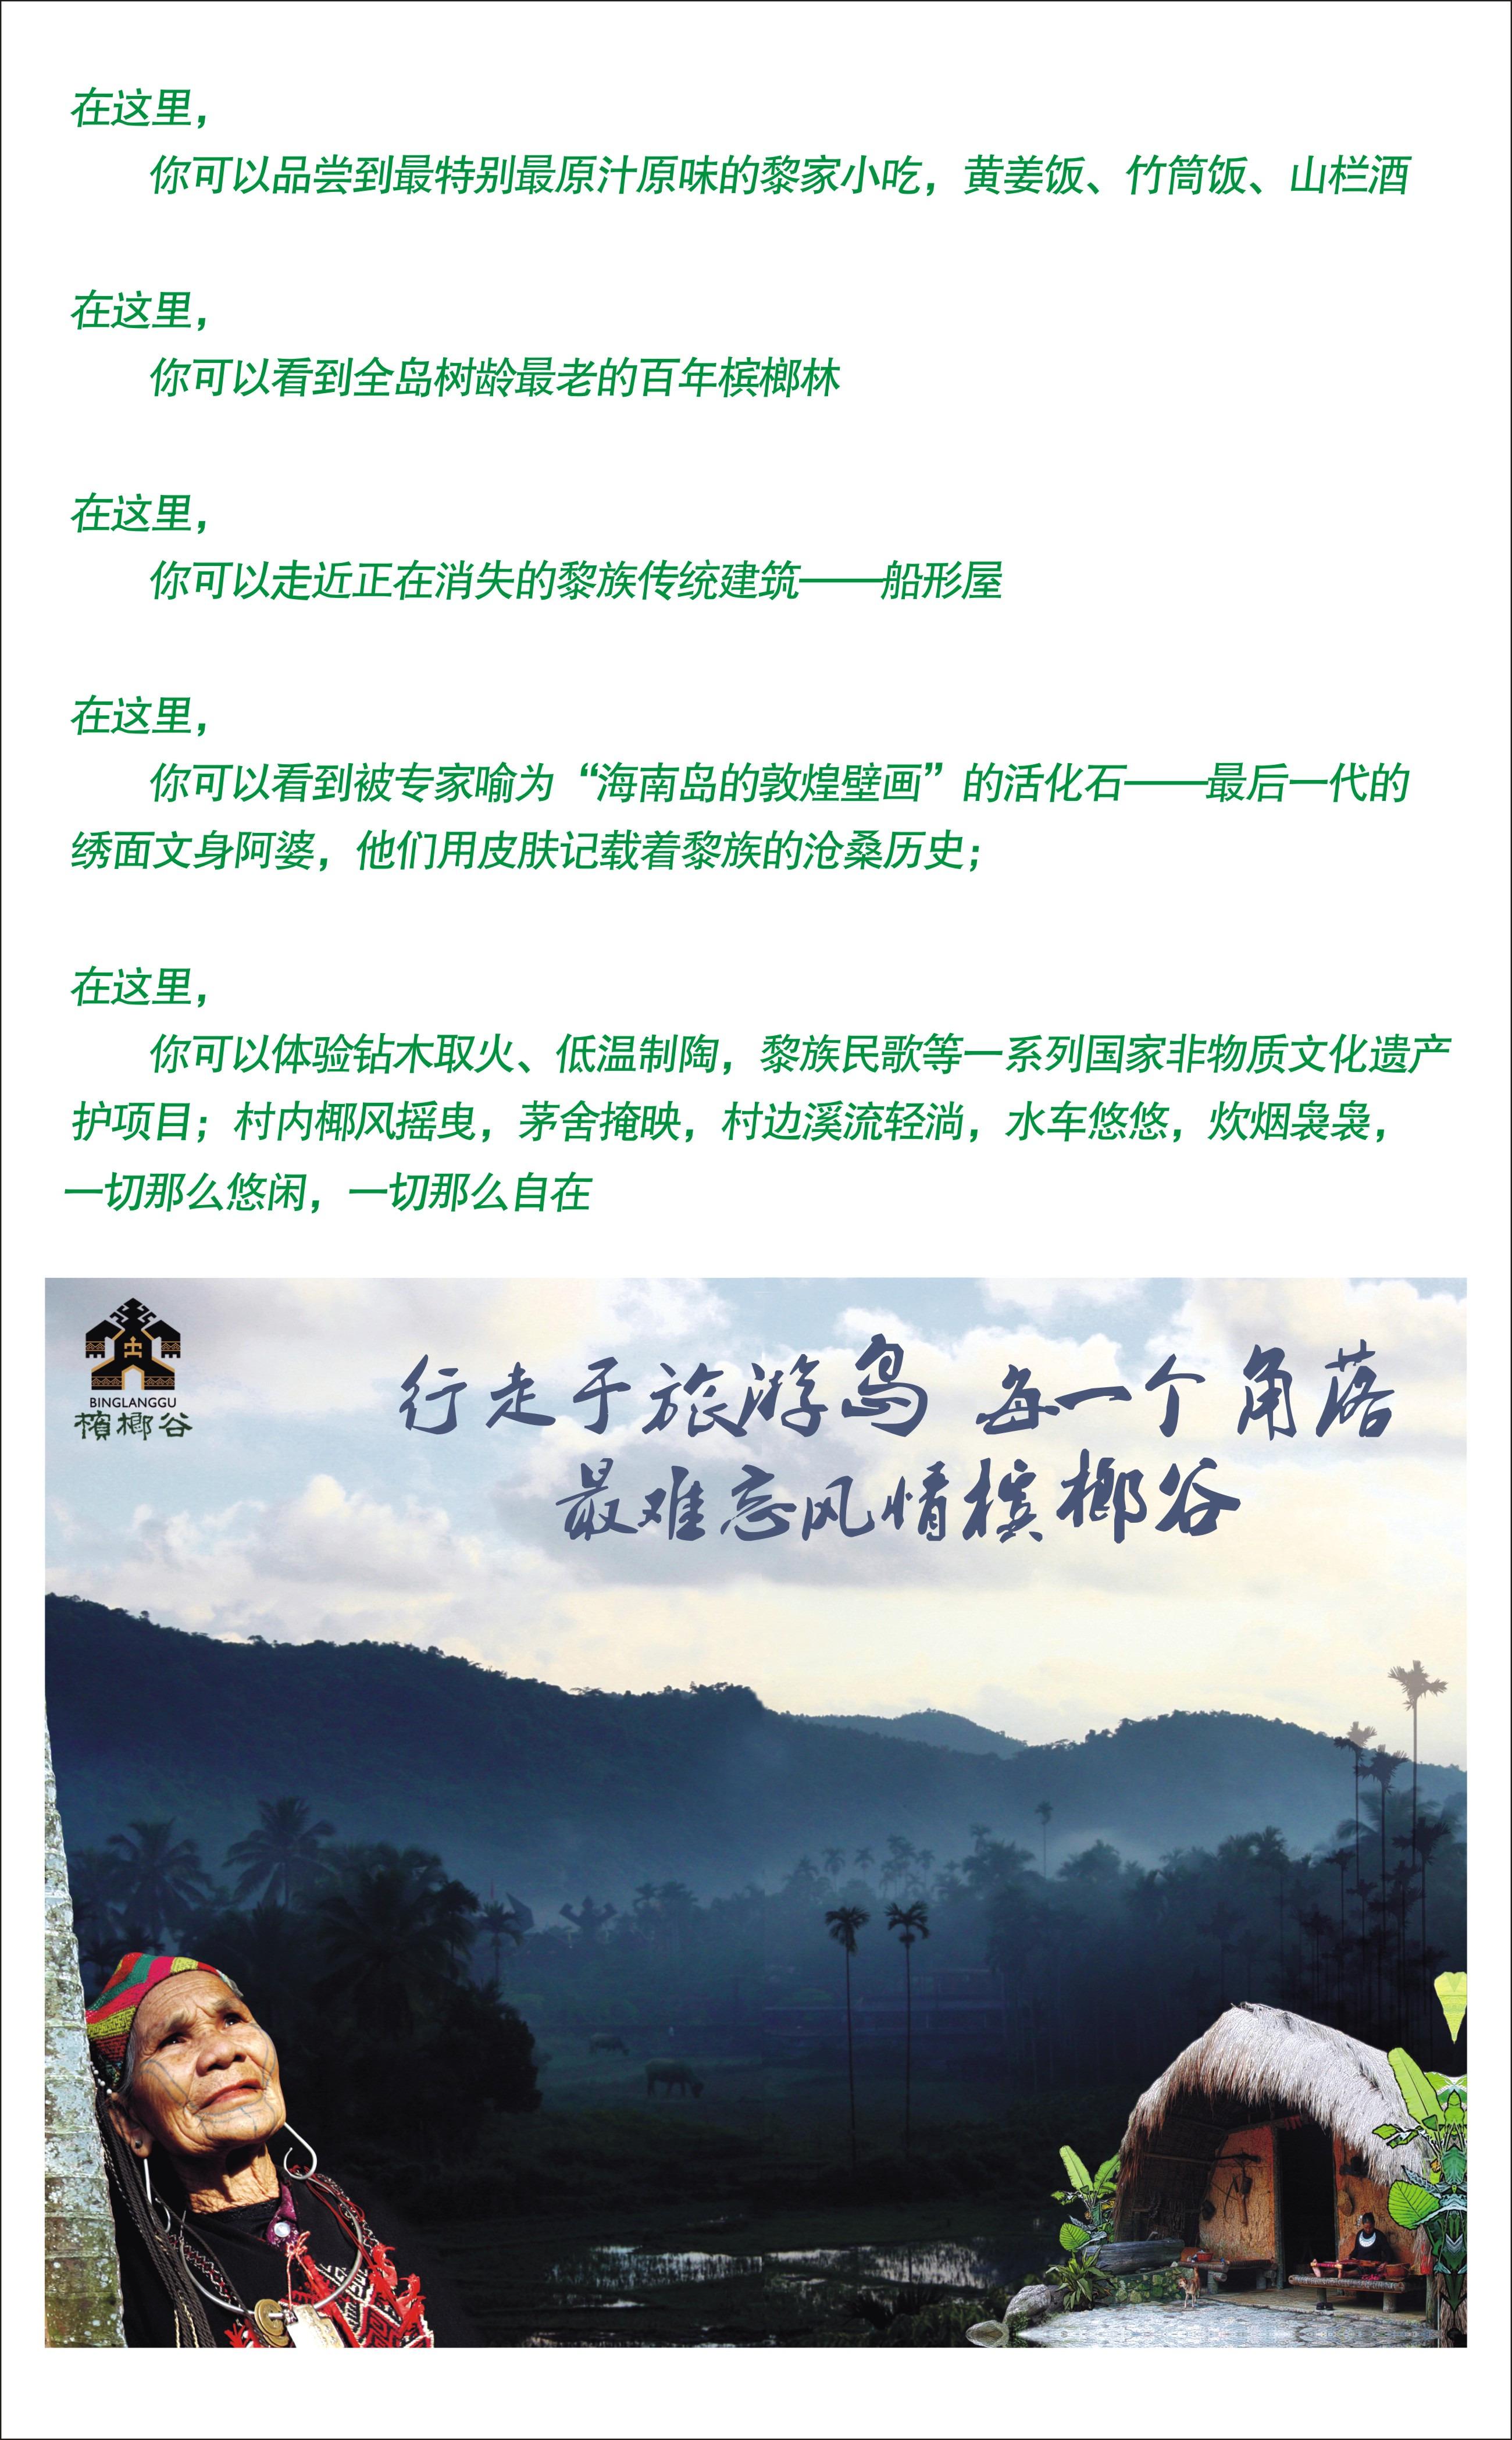 【Q】三亚独立小包团包门票纯玩定制包车专车一日游 (槟榔谷)